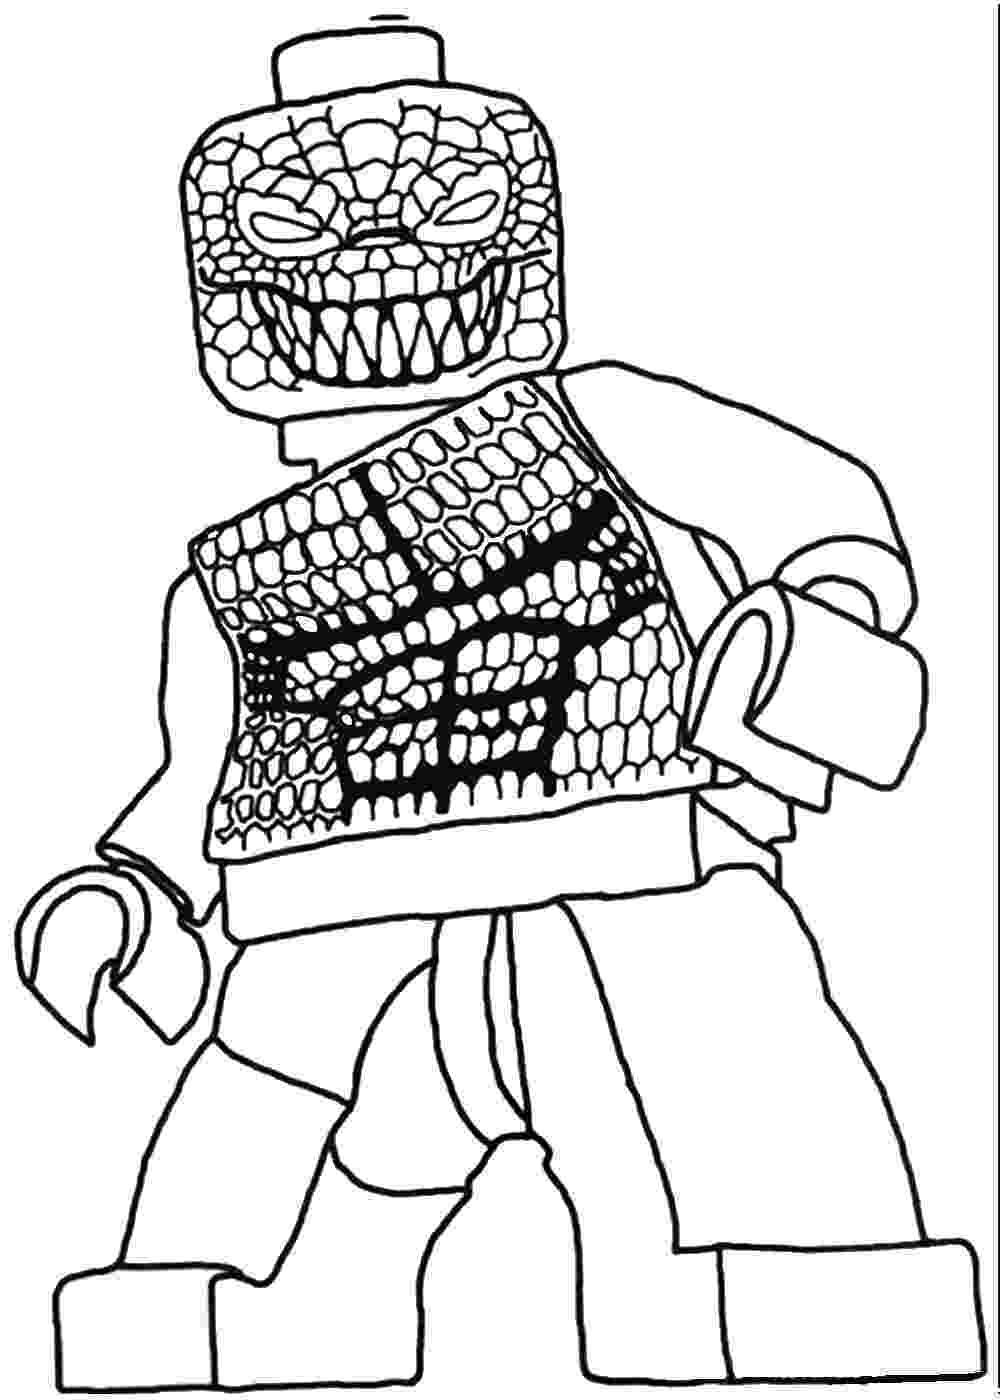 lego batman colouring kids n funcom 16 coloring pages of lego batman movie lego batman colouring